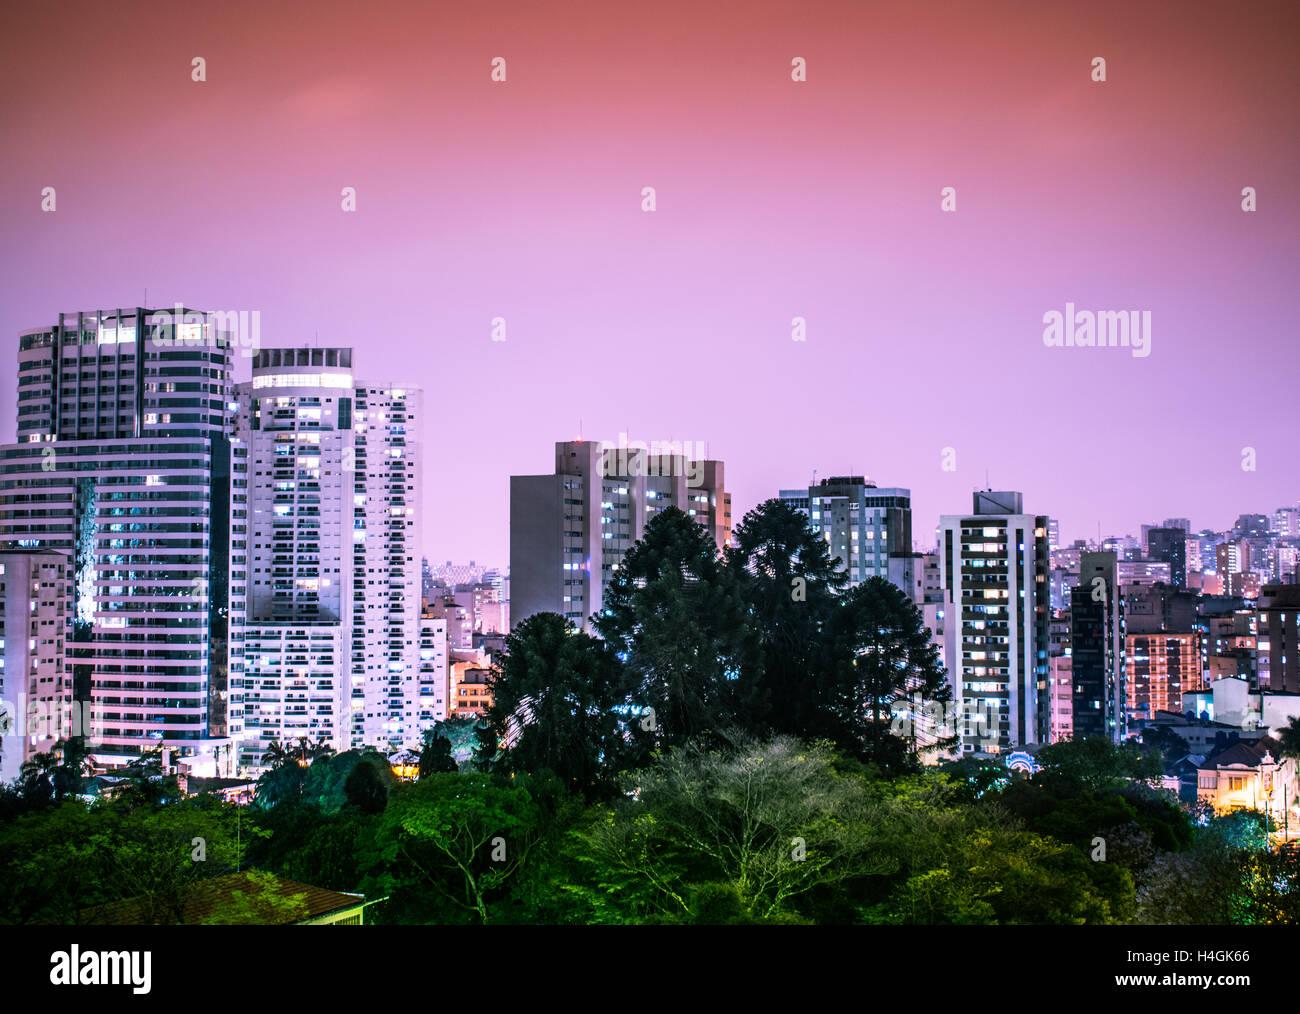 Un panorama di edifici di São Paulo, Brasile Immagini Stock